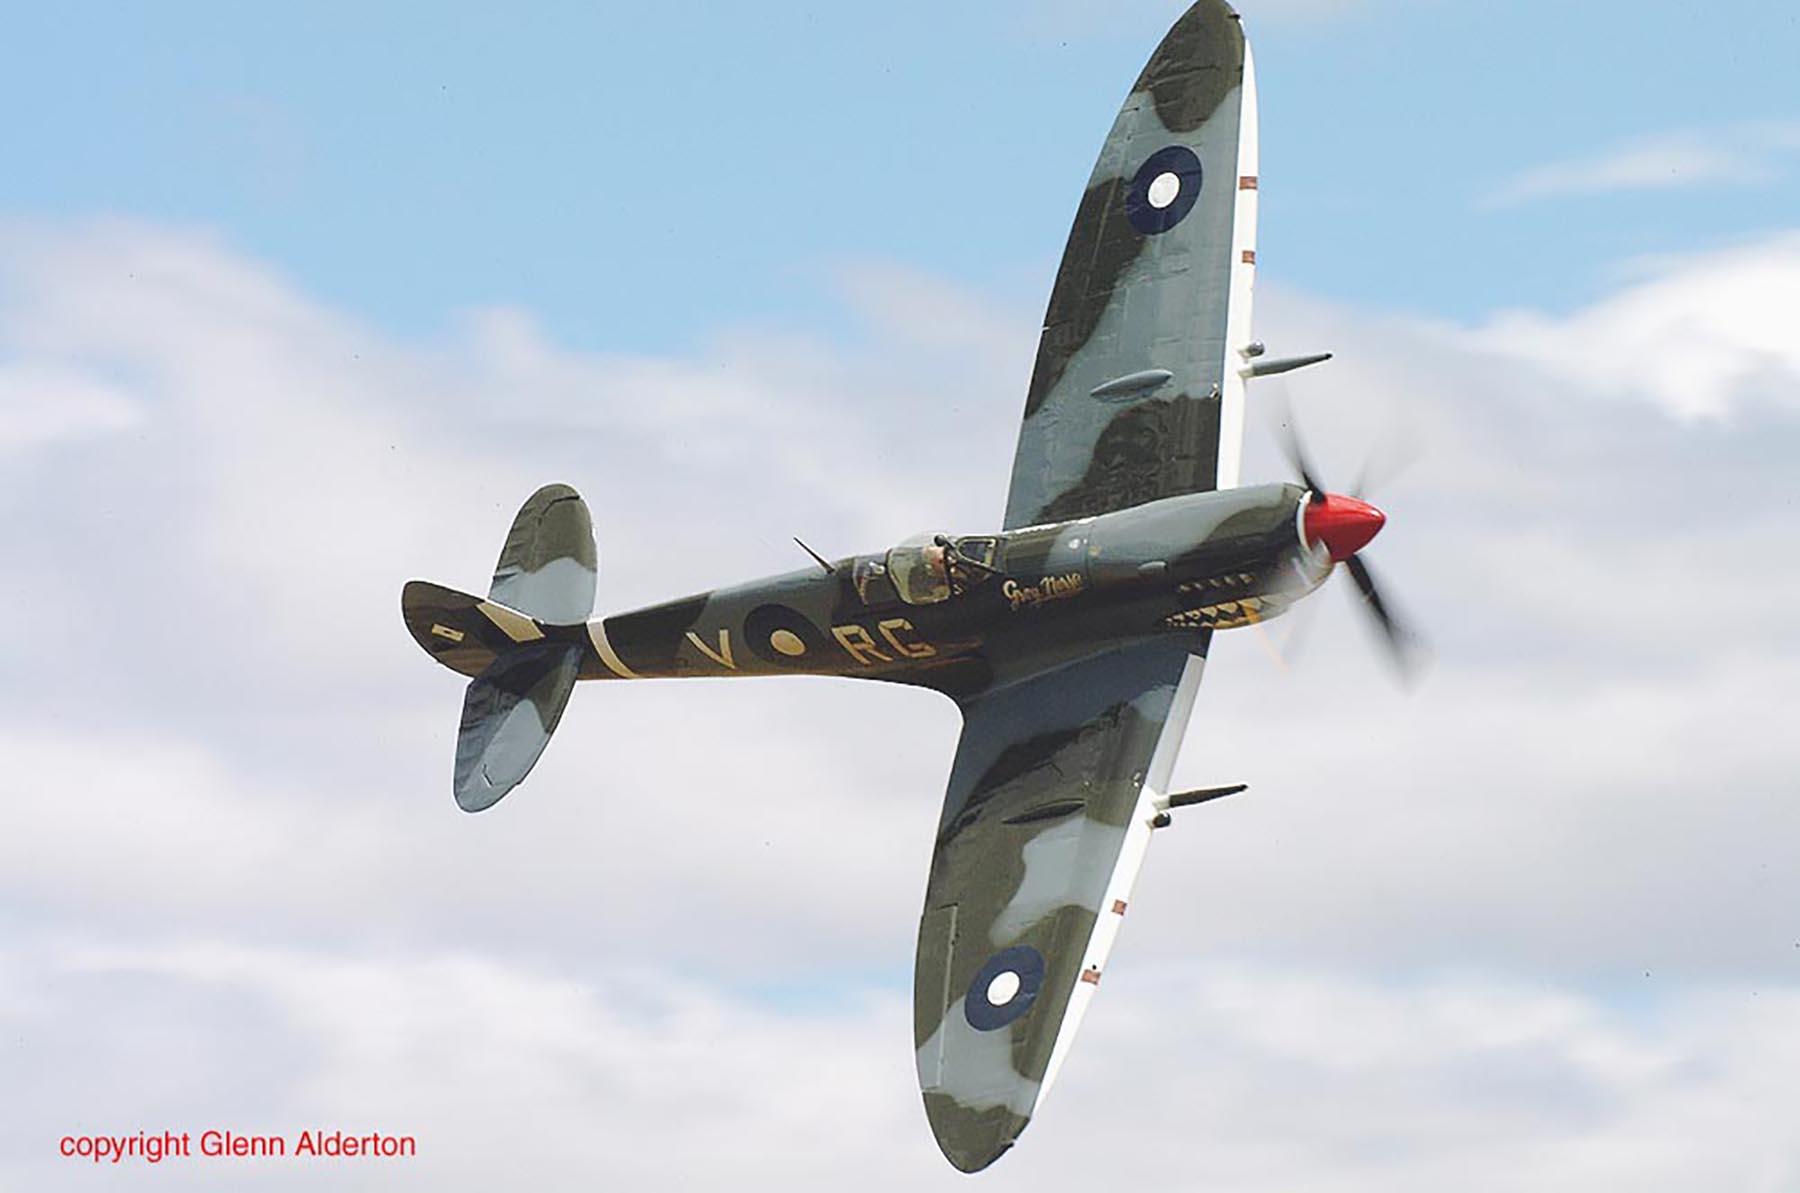 Airworthy Spitfire warbird RAAF 457Sqn RGV A58 602 12